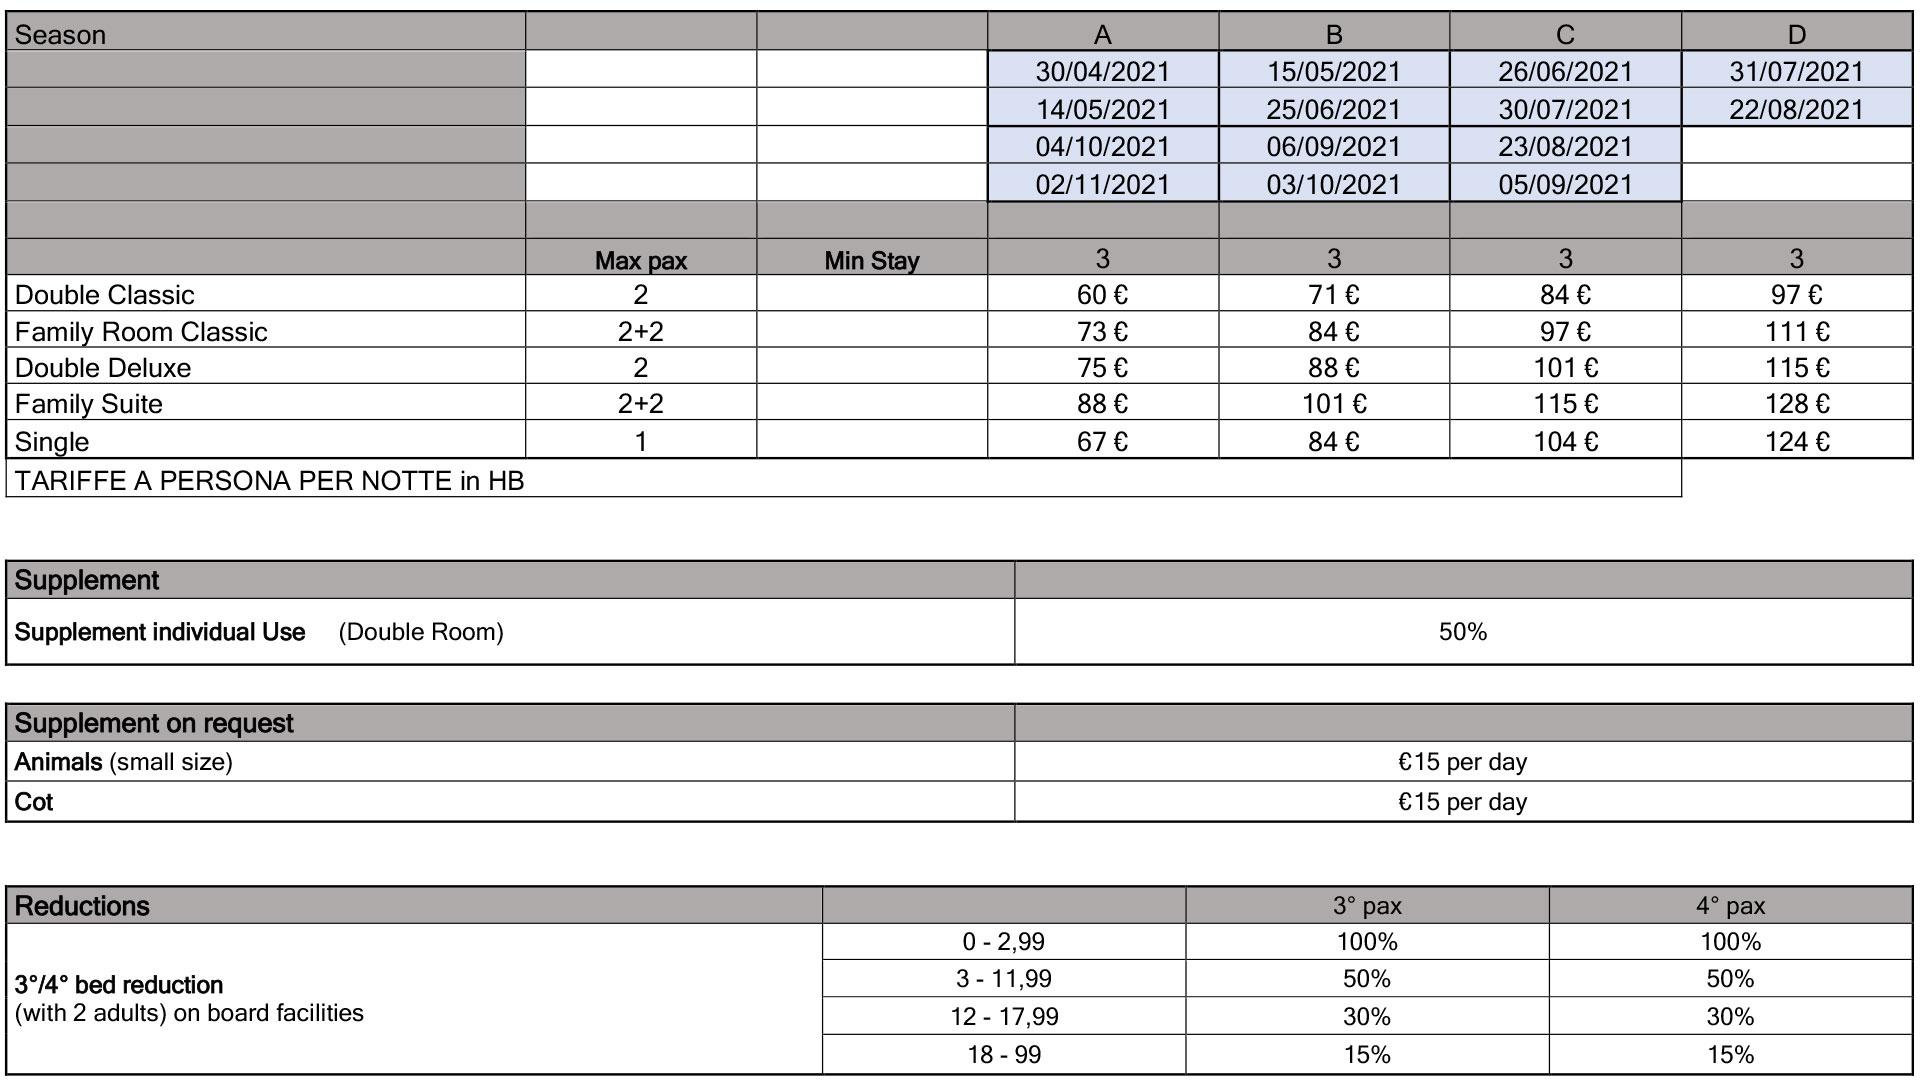 koflerhof-tabella-prezzi-2021-1